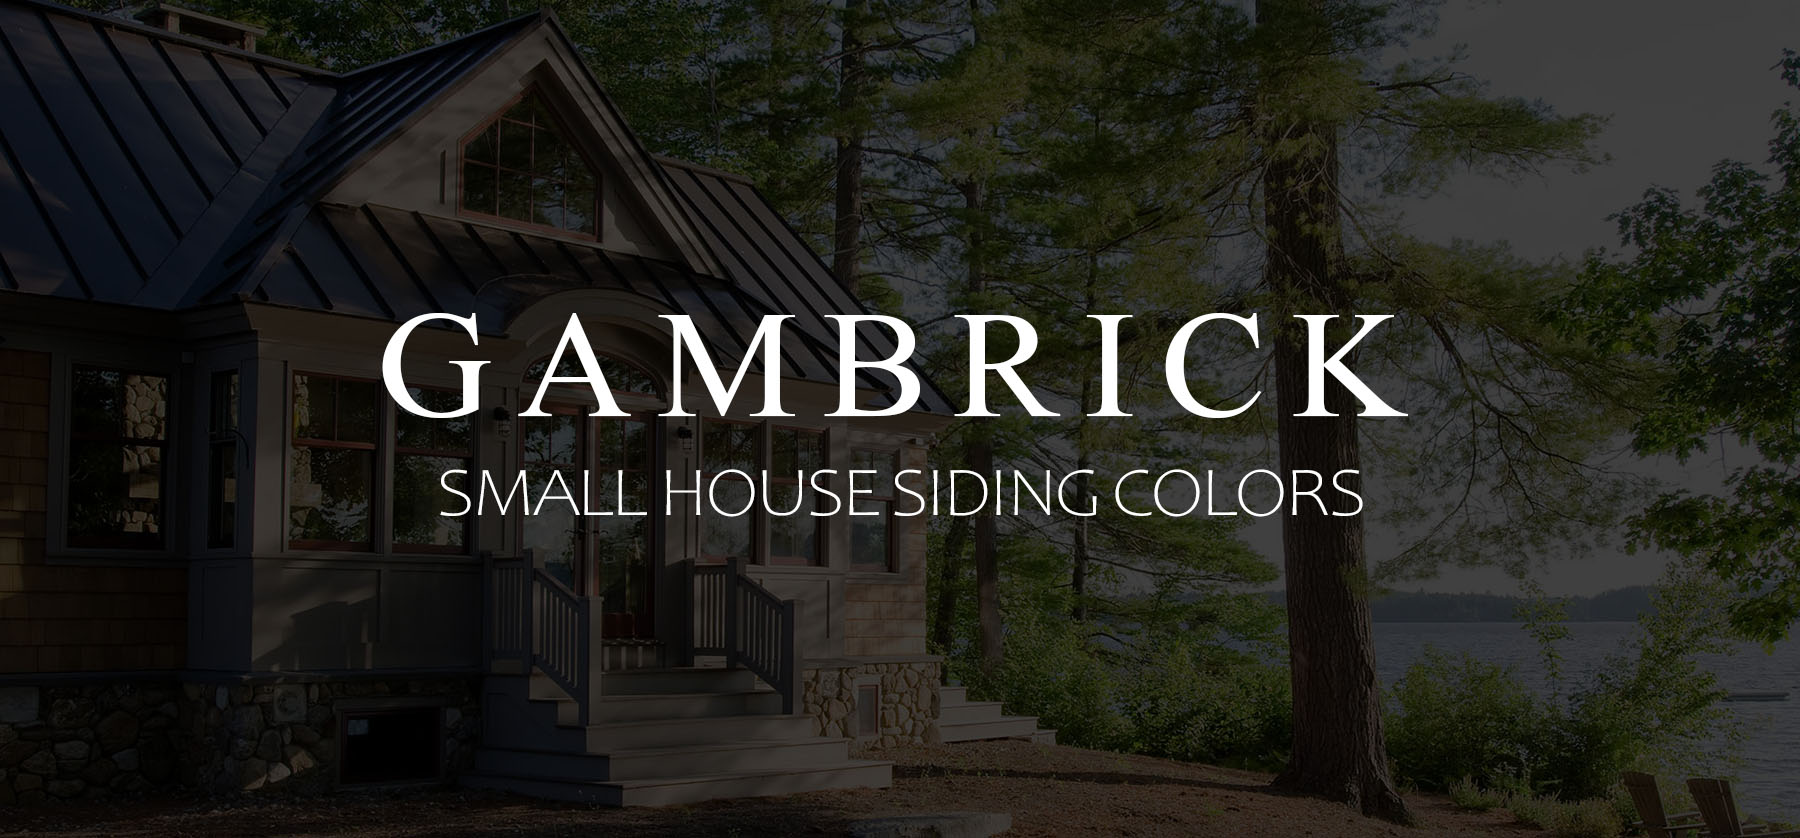 Top Small House Siding Colors Nj Custom Home Builder Gambrick